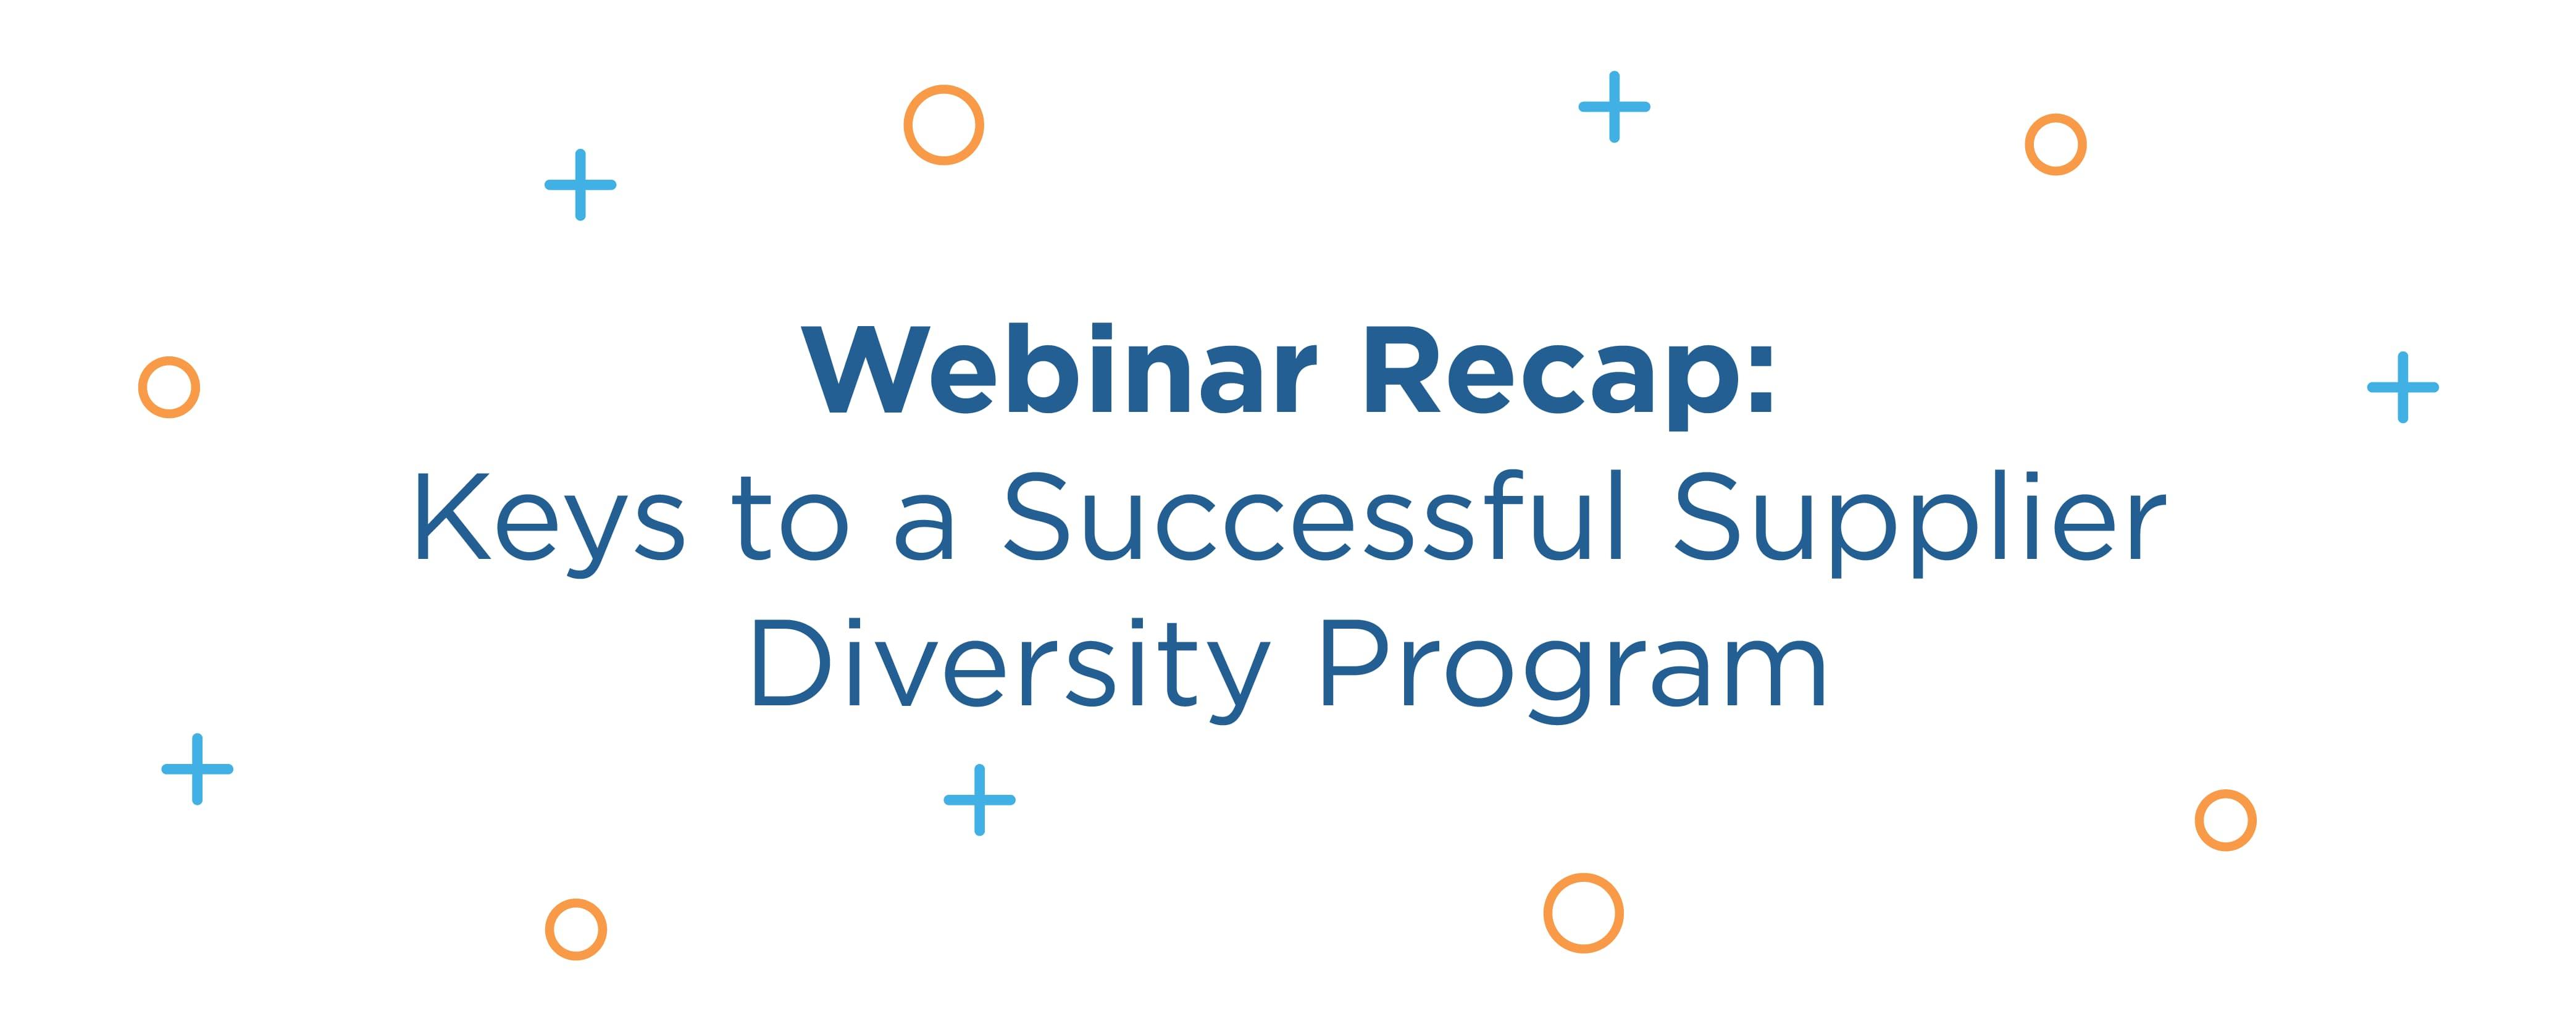 Webinar Recap: Keys to a Successful Supplier Diversity Program